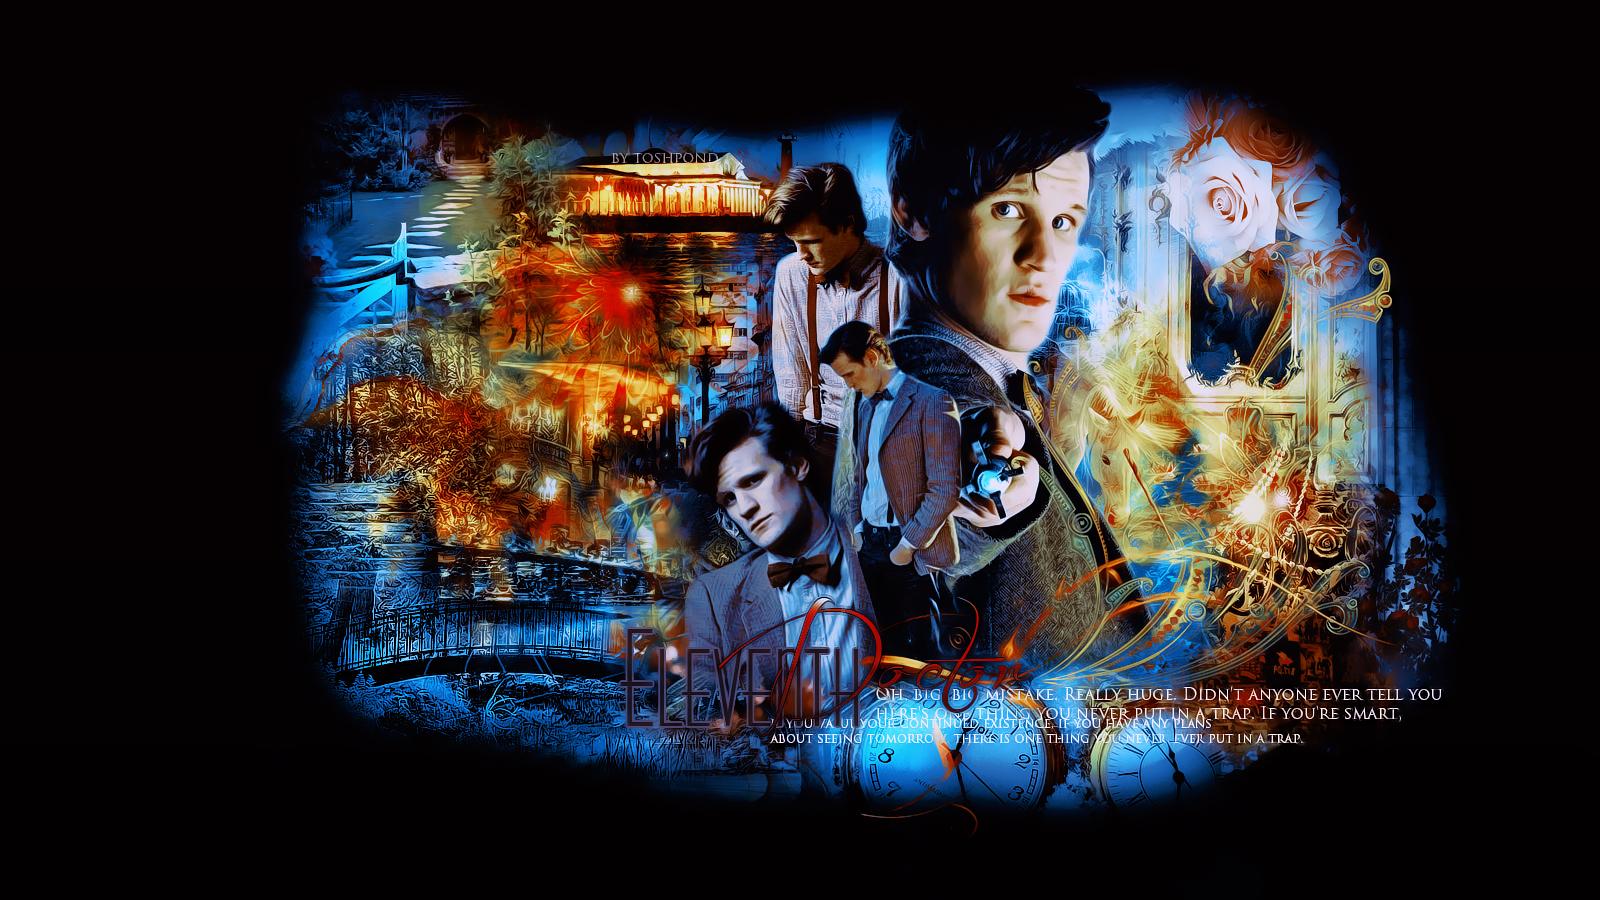 eleventh doctor wallpaper by toshpond on deviantart